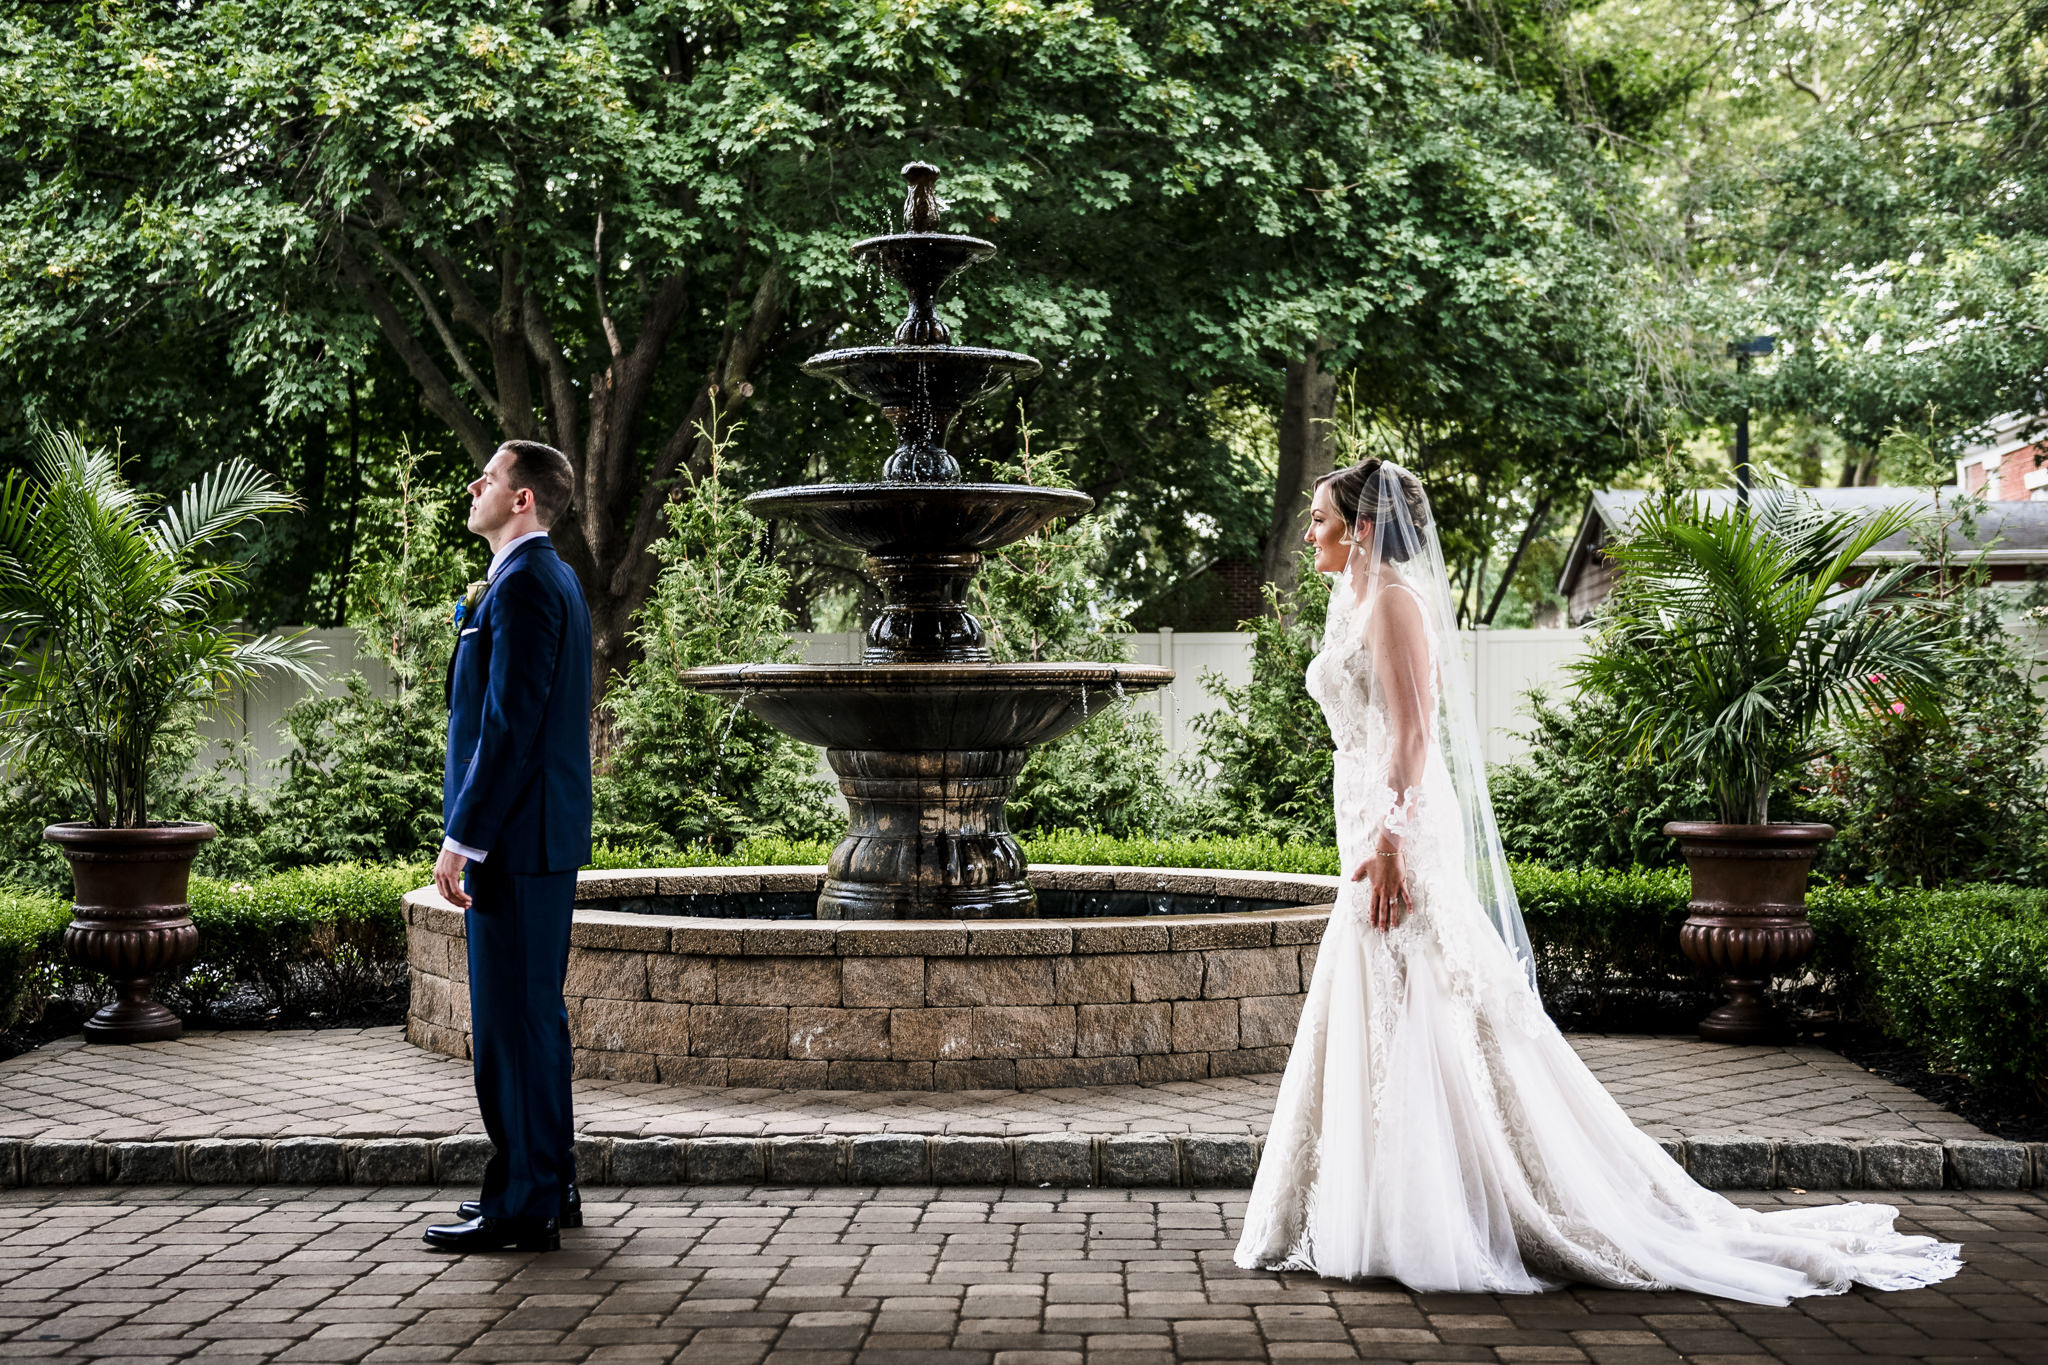 Brennan-South-Gate-Manor-New-Jersey-Wedding-Photographer-10.JPG